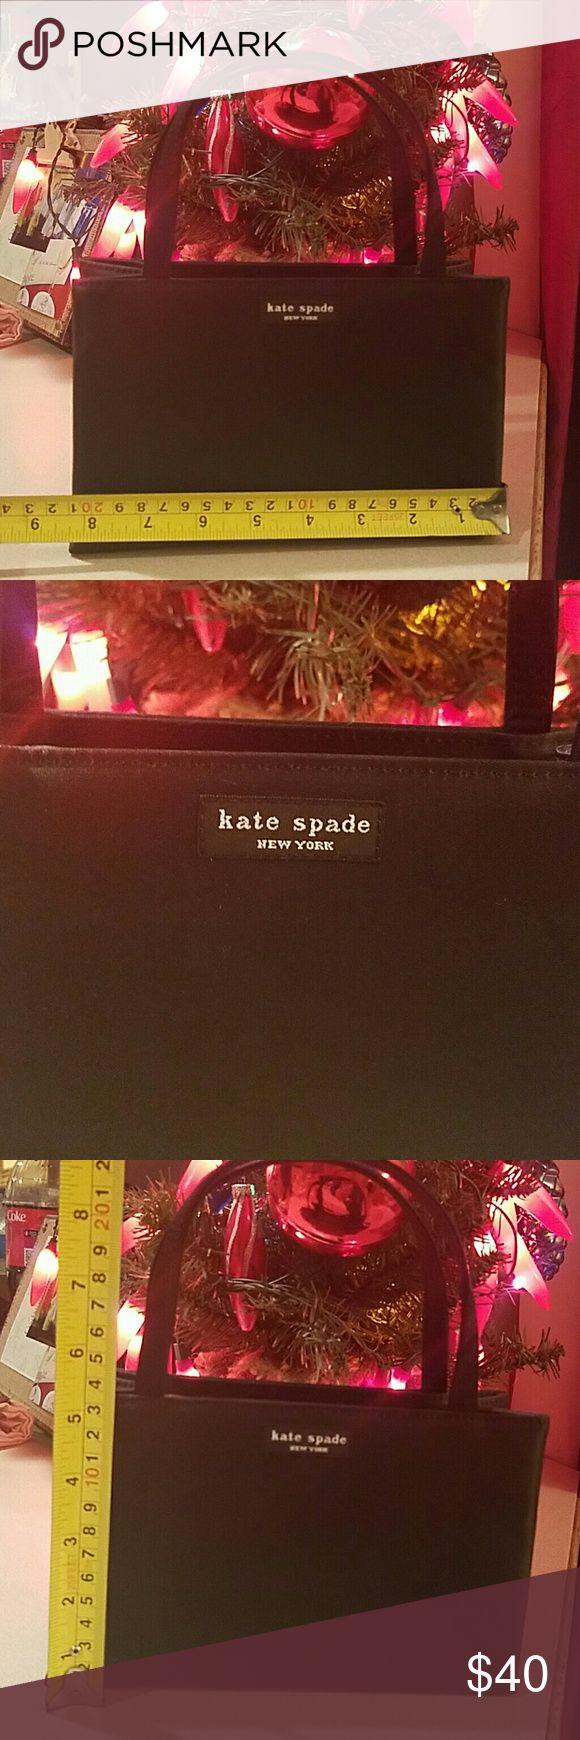 Selling this Mini Nylon Kate Spade Tote on Poshmark! My username is: spoiledbratenvy. #shopmycloset #poshmark #fashion #shopping #style #forsale #kate spade #Handbags